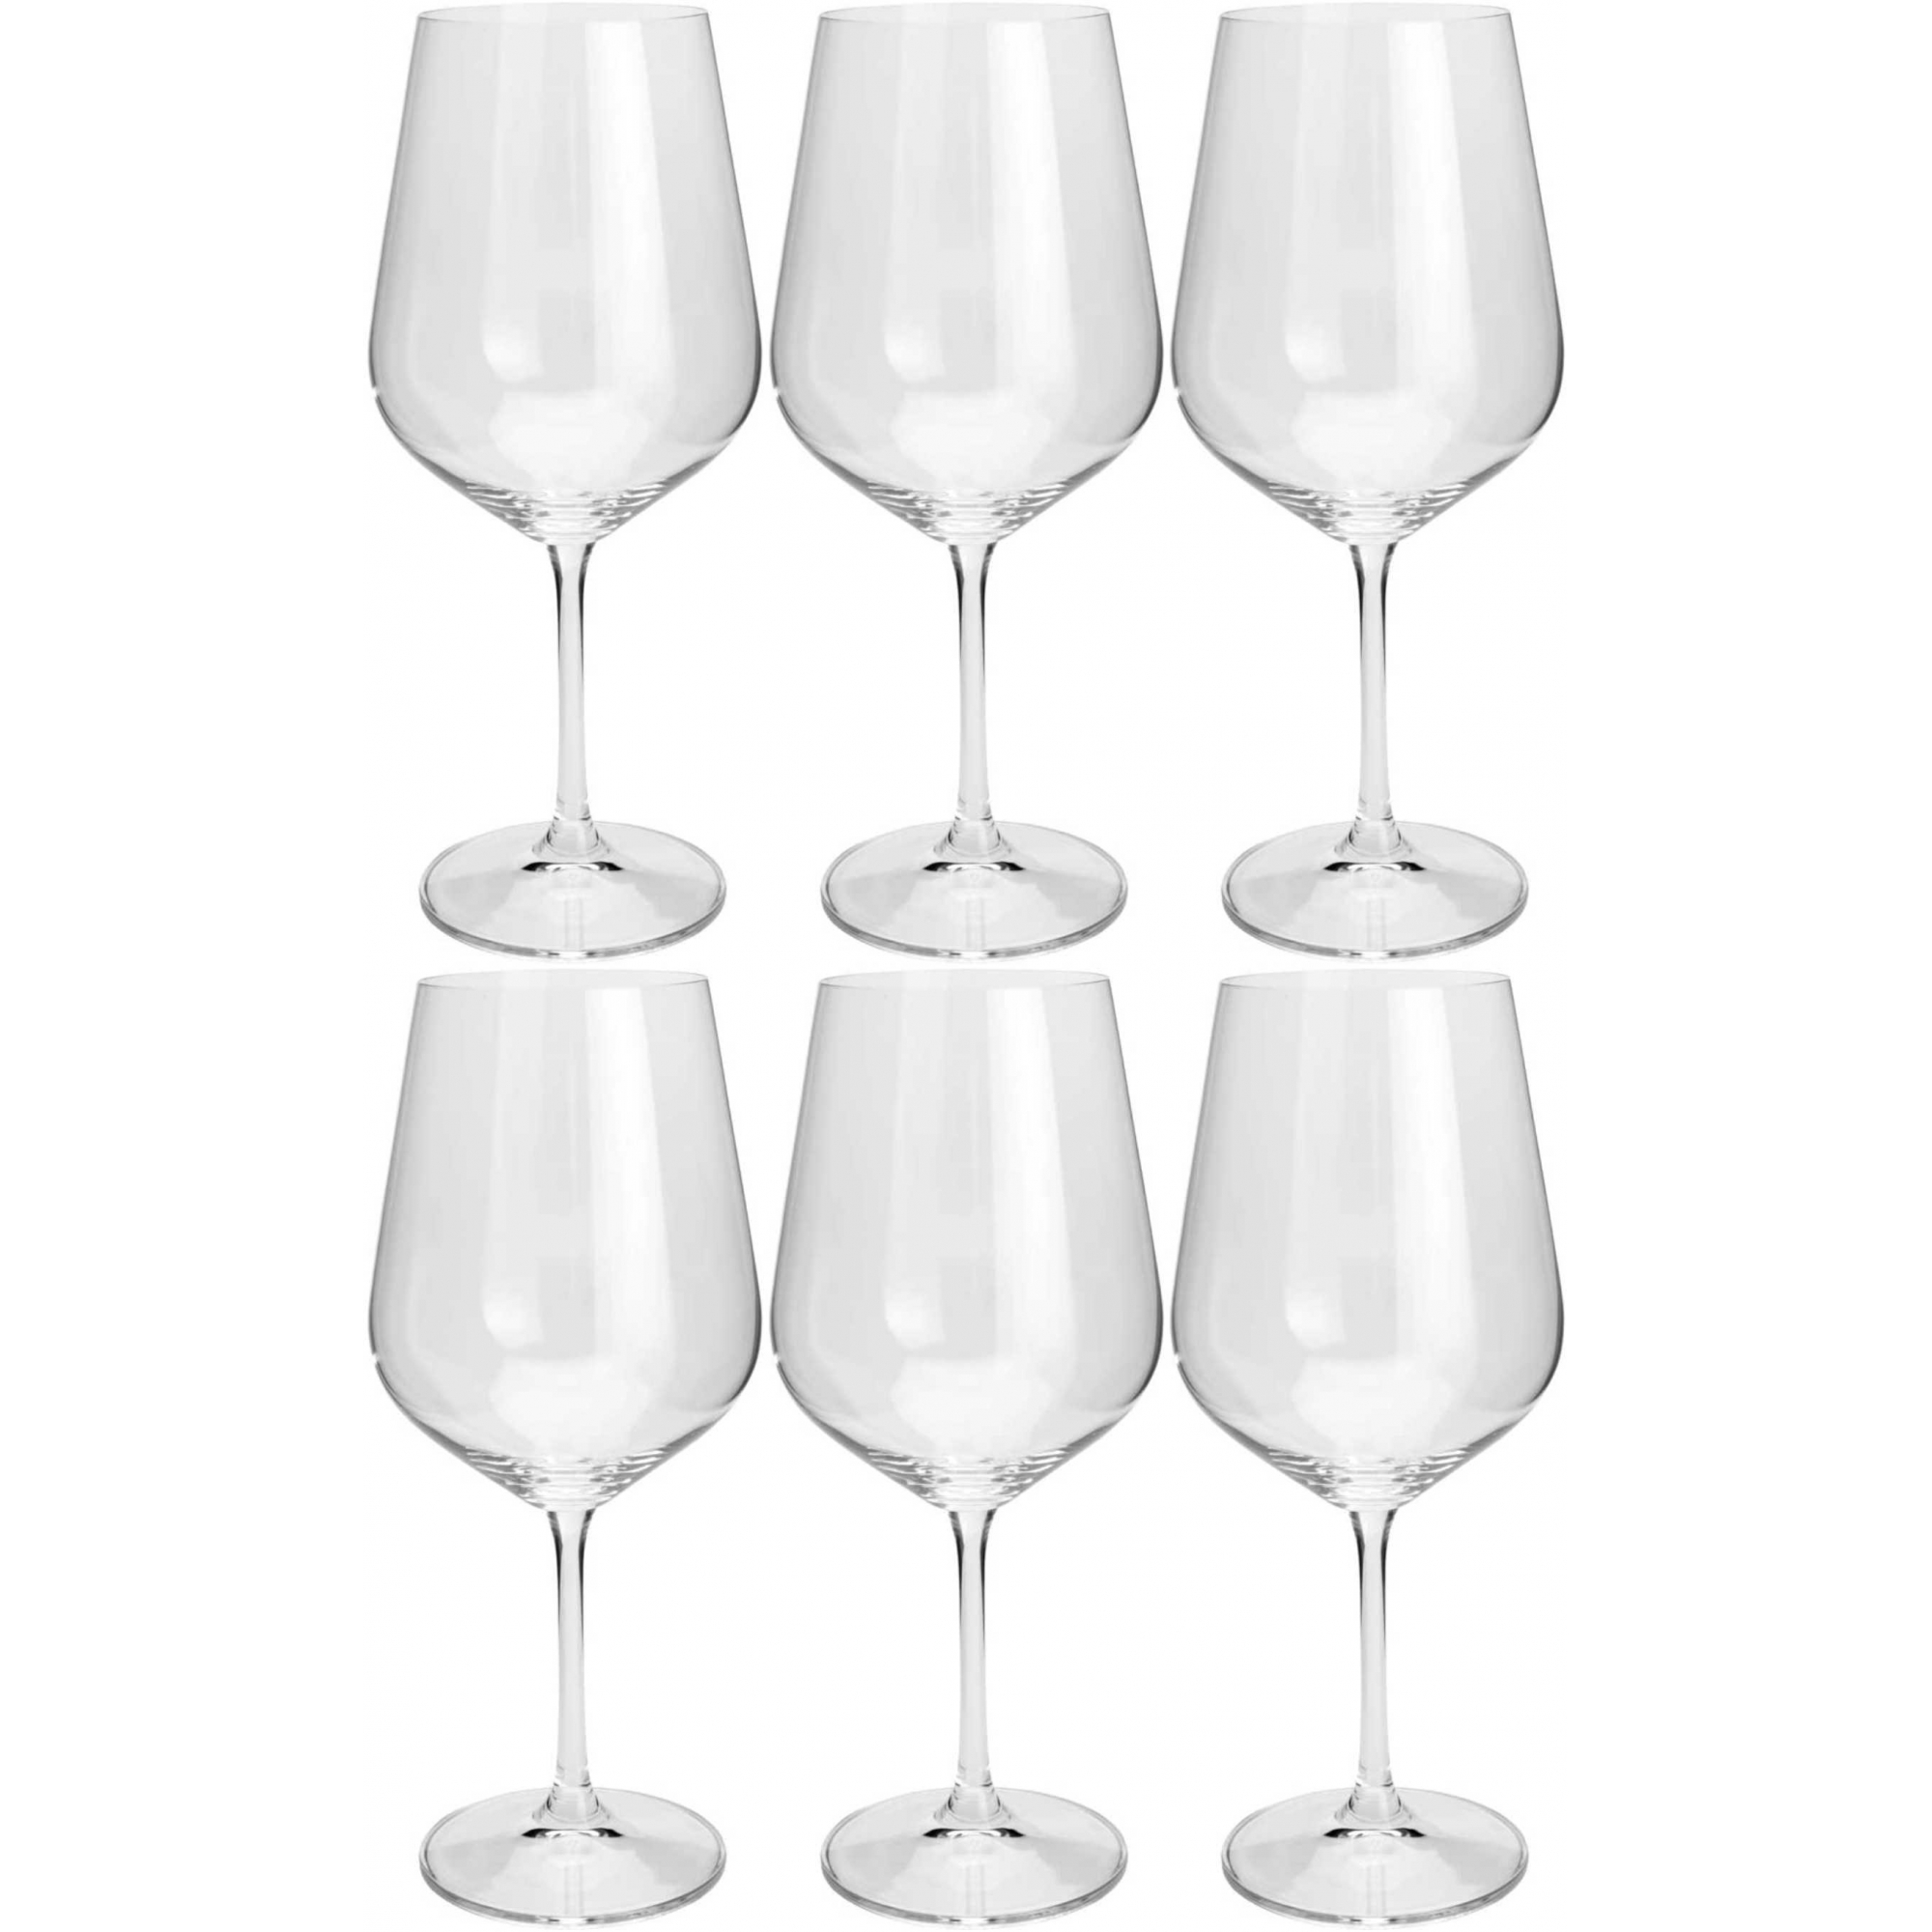 Conjunto 6 Taças 580ml Para Água de Cristal Ecologico Strix - Lyor